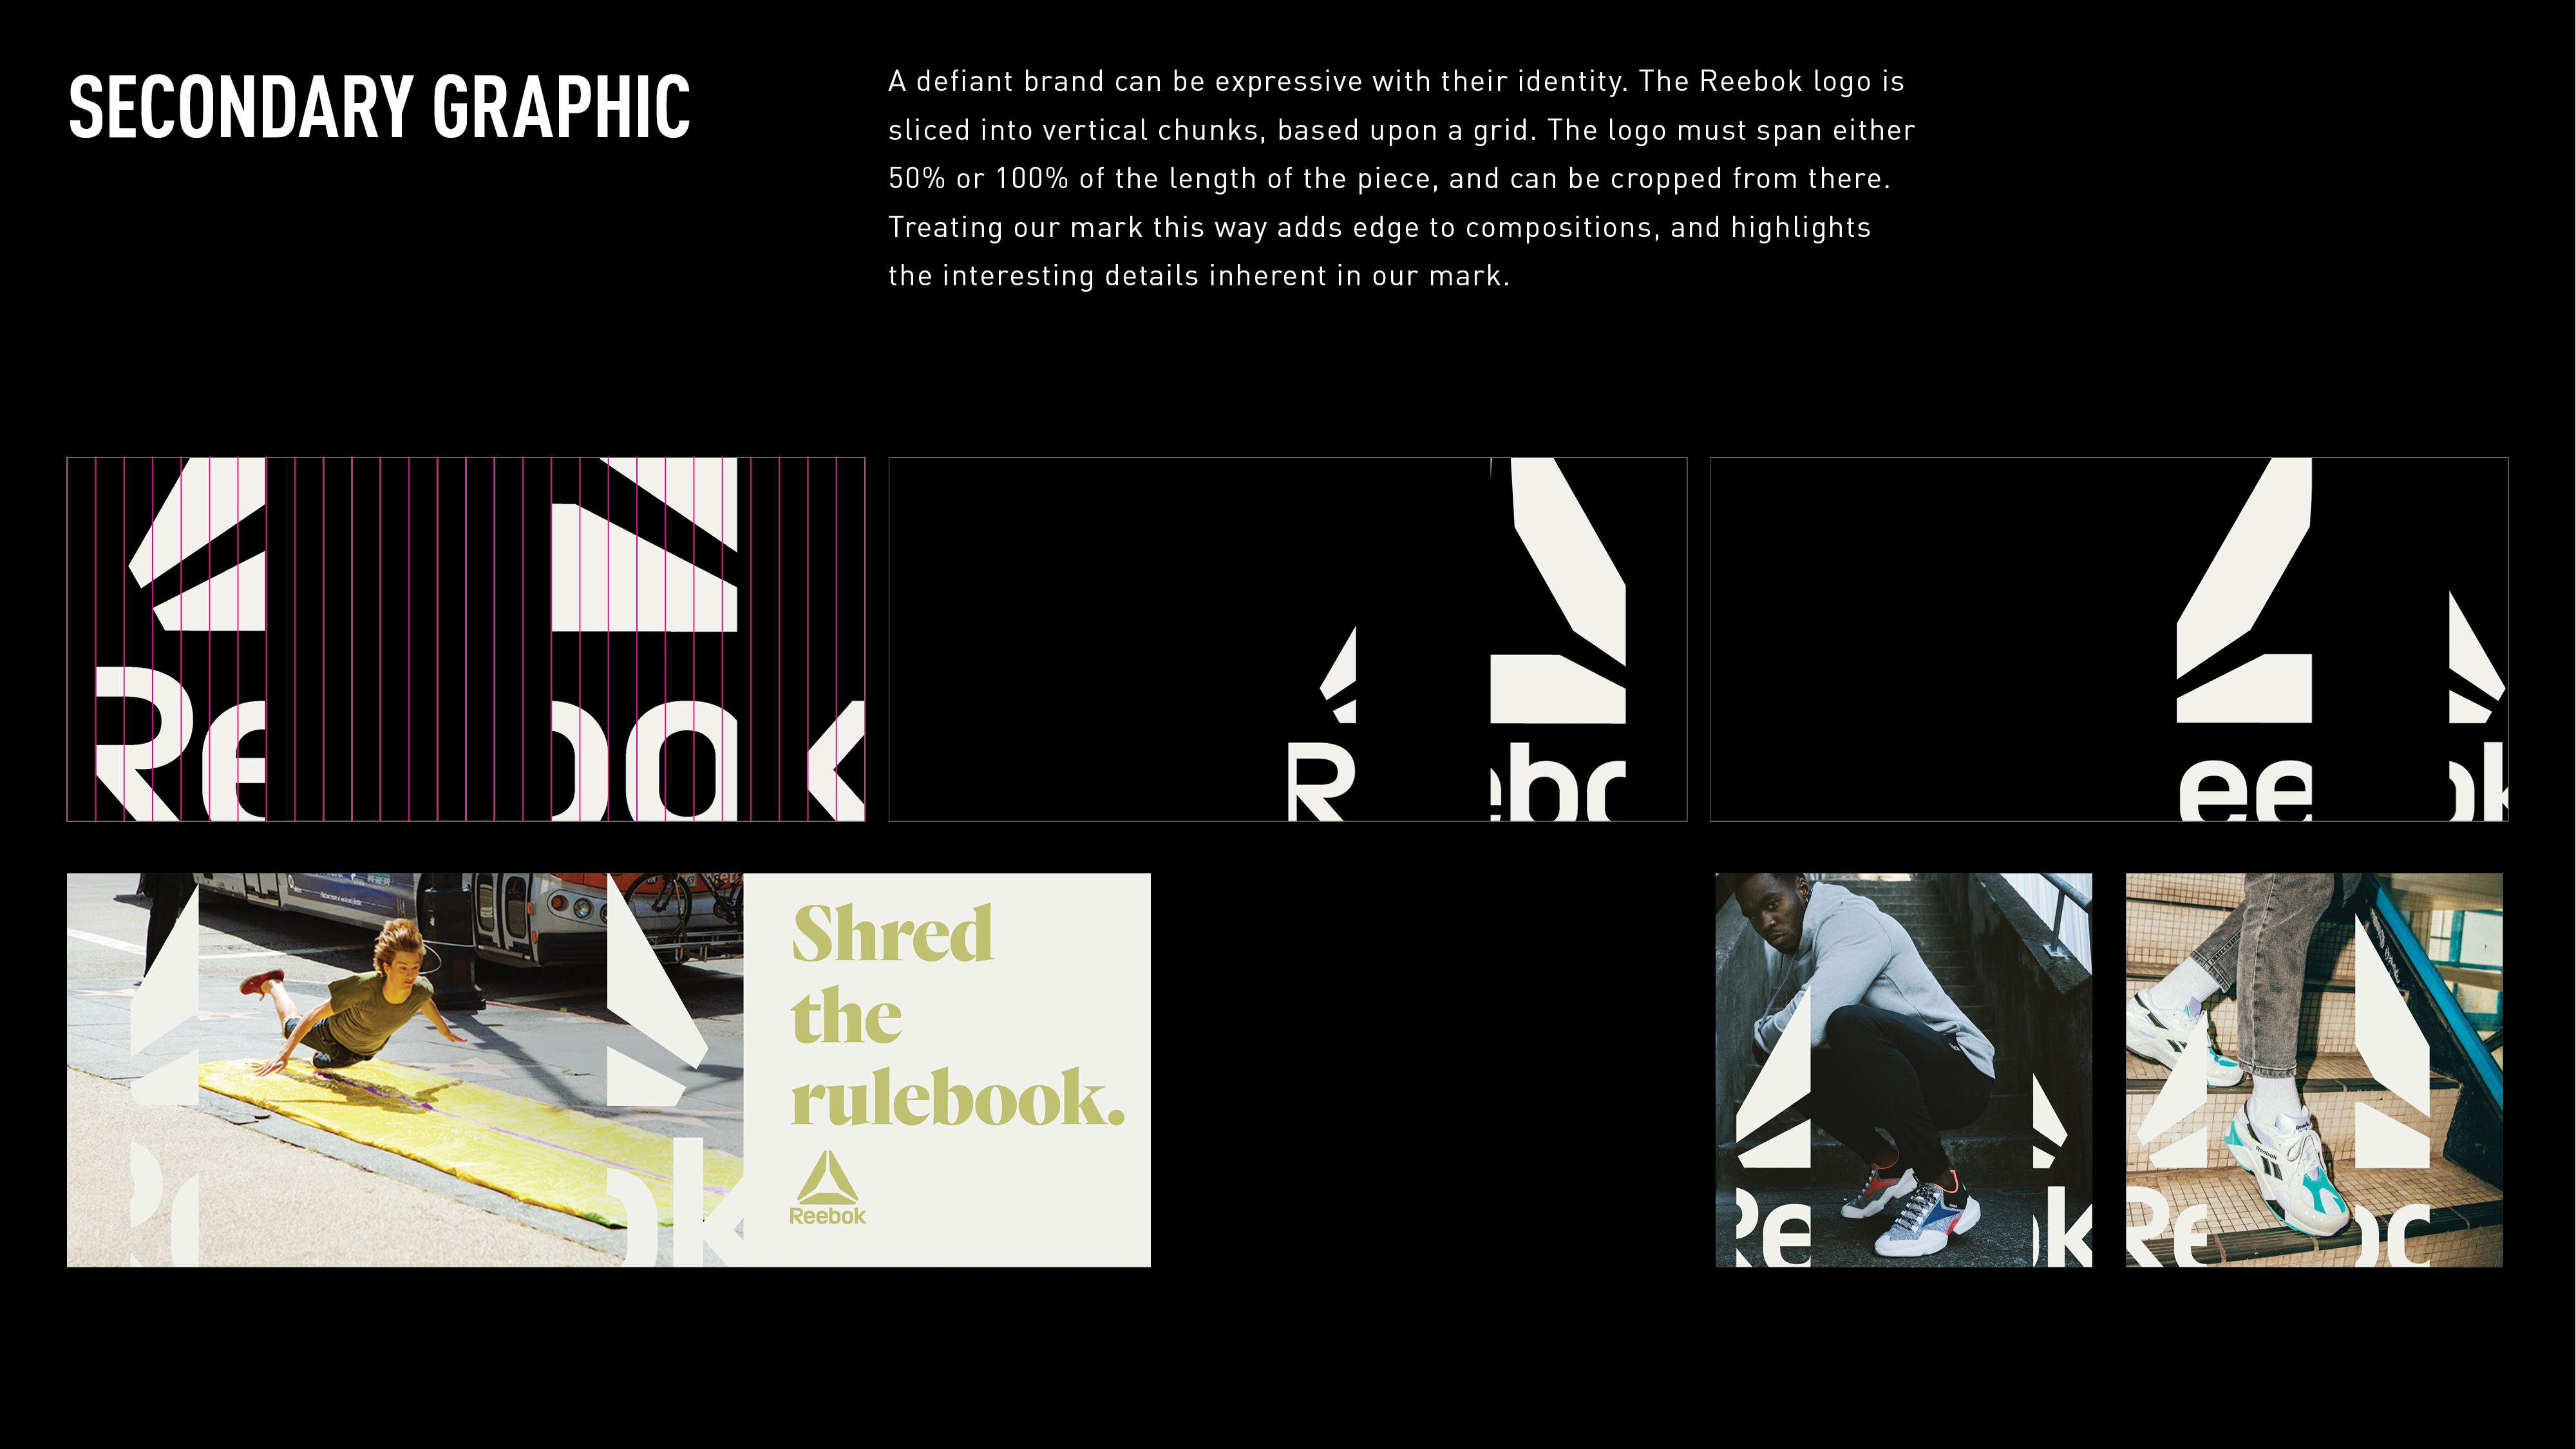 RBK_FW19_Design_Quarto_HRZ_CL_1920x1080_